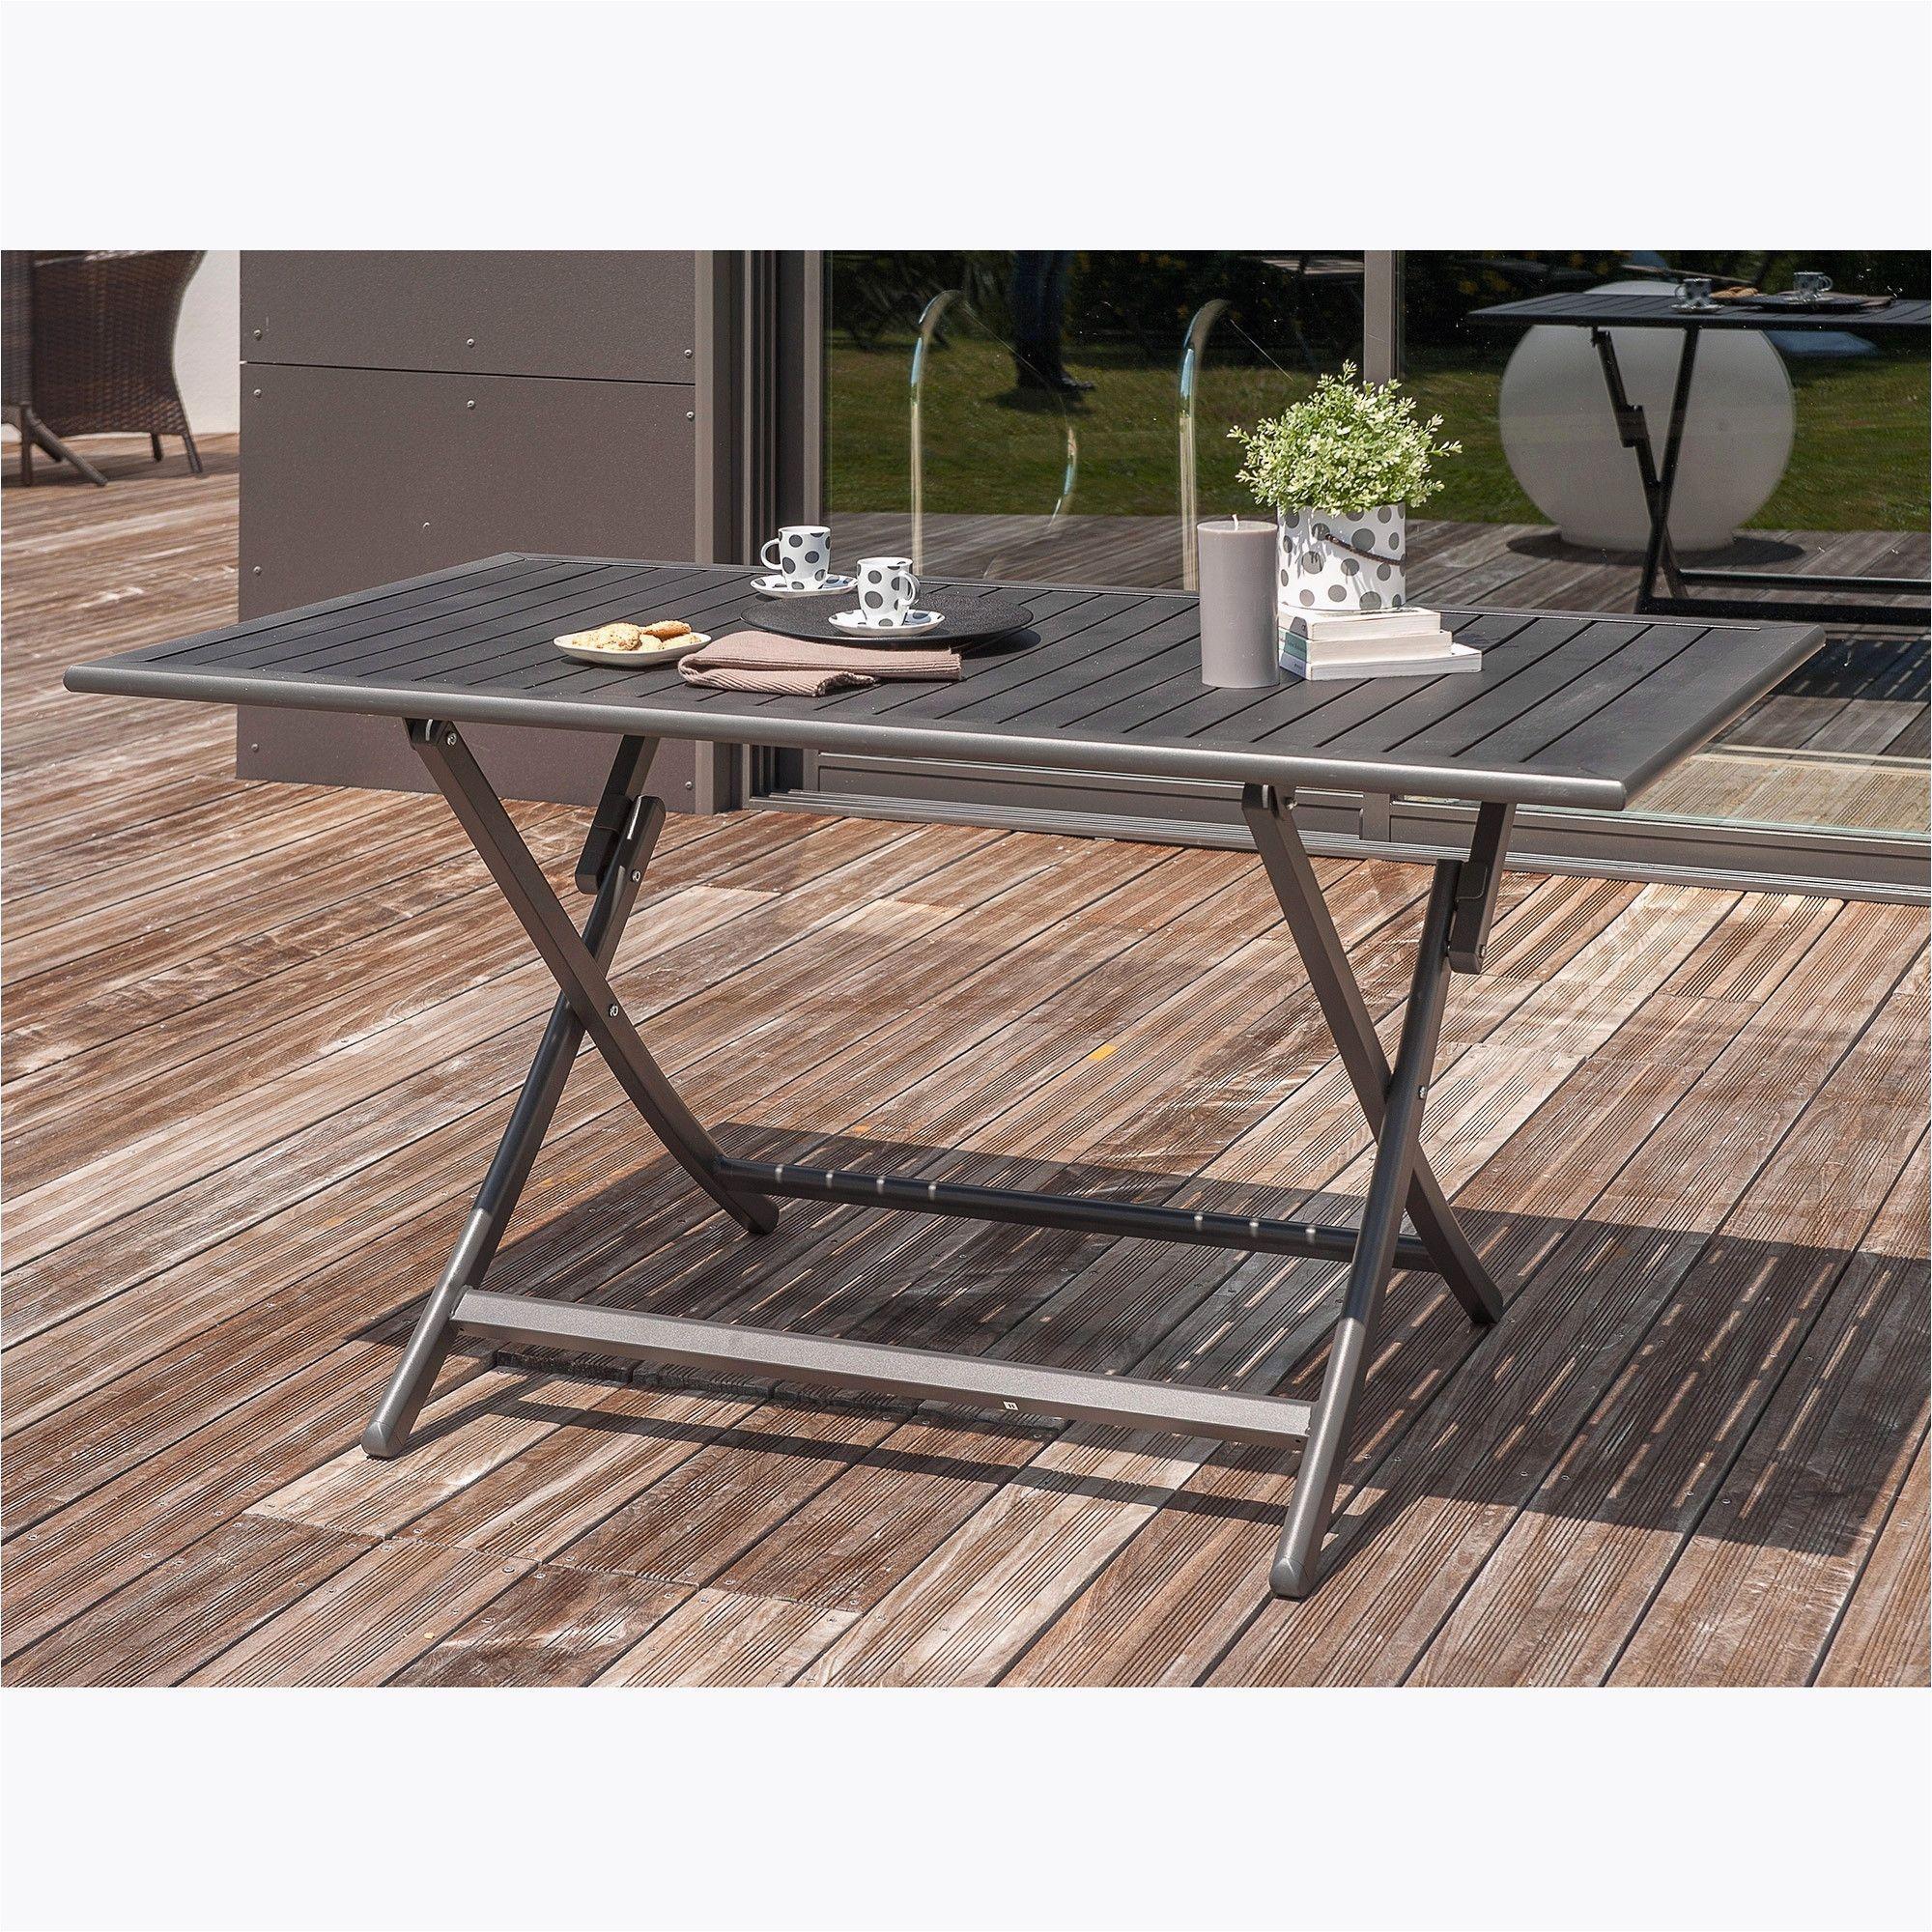 Salon De Jardin En Resine Luxe Table Pliante Leclerc Beau S Leclerc Table De Jardin